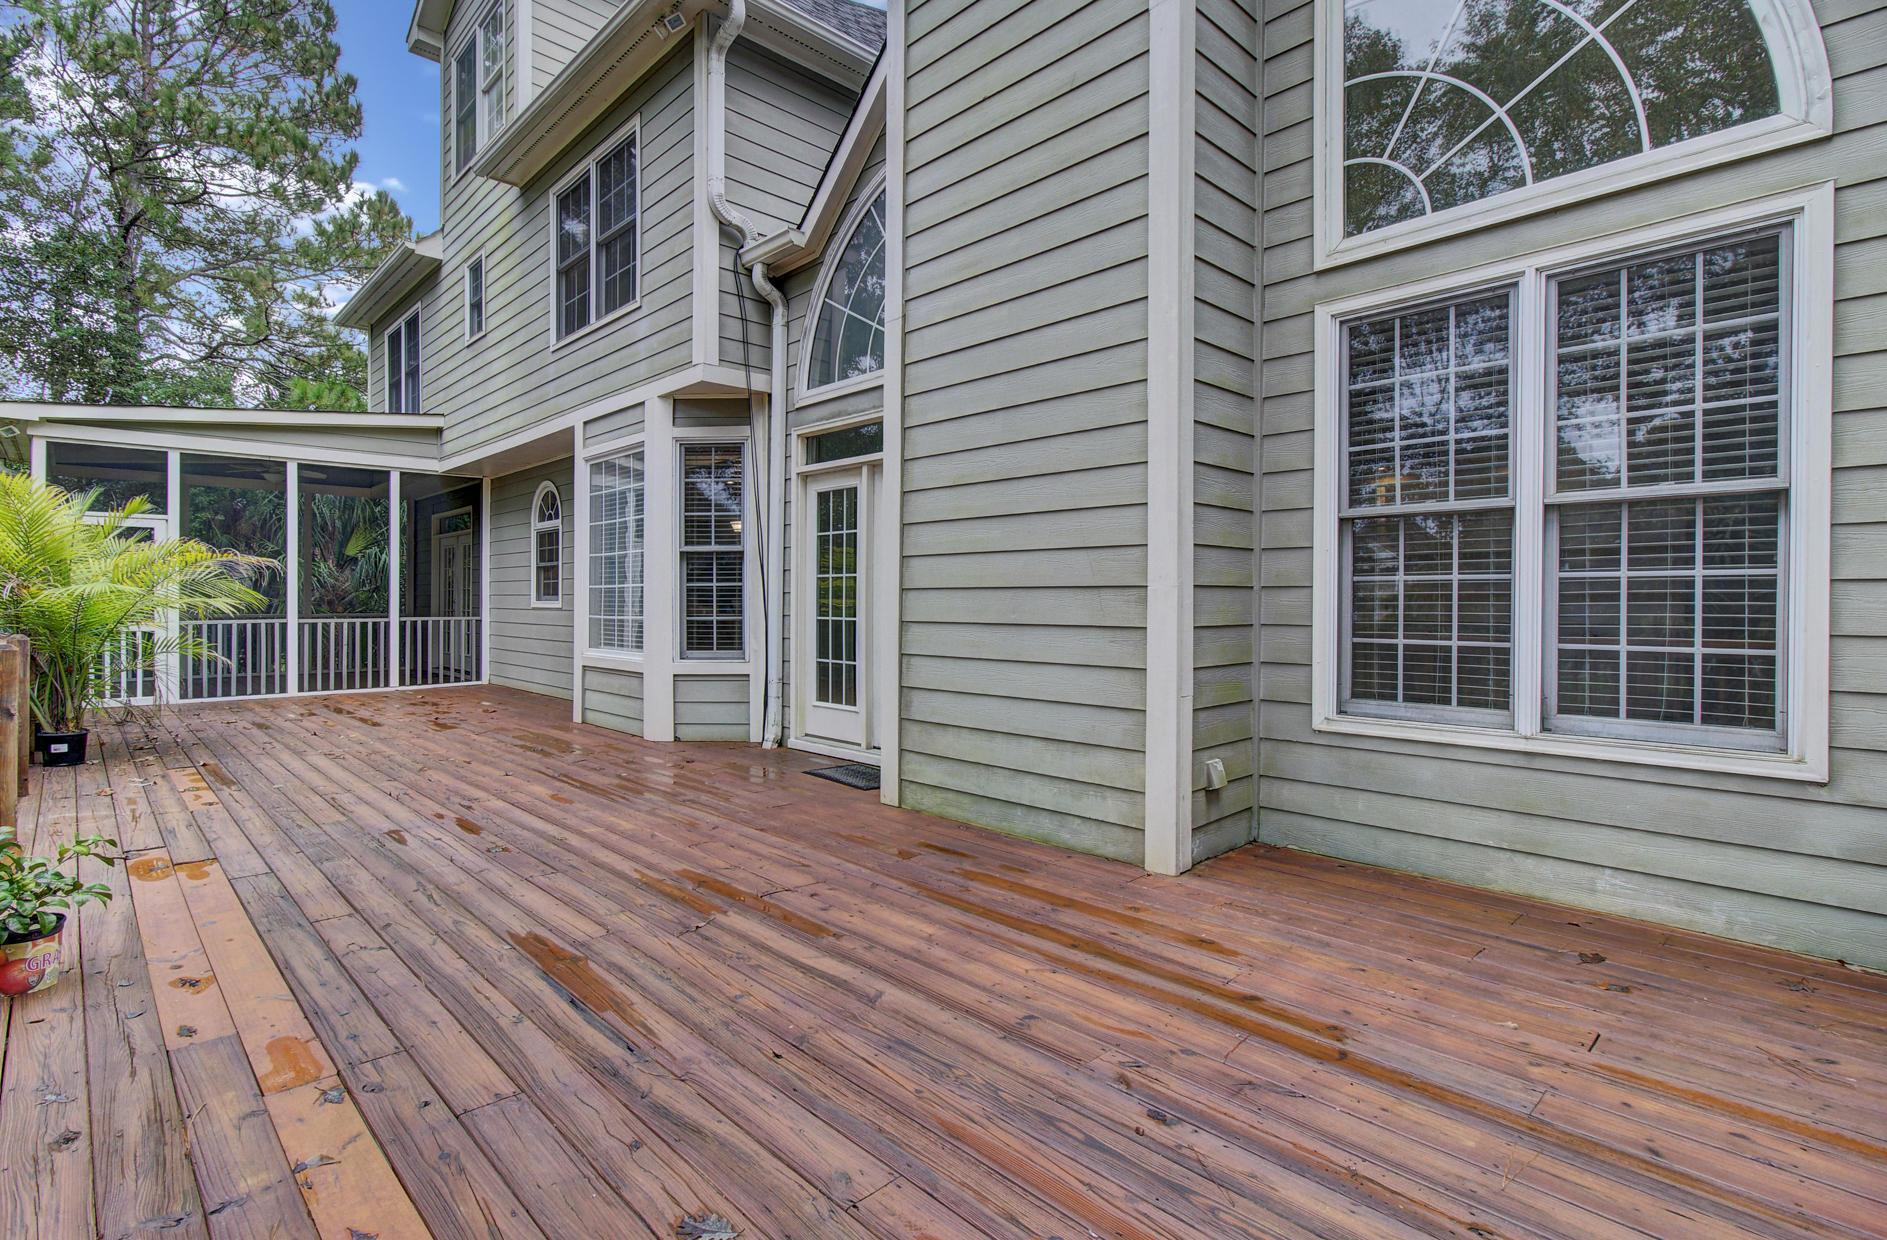 Dunes West Homes For Sale - 2321 Darts Cove, Mount Pleasant, SC - 14